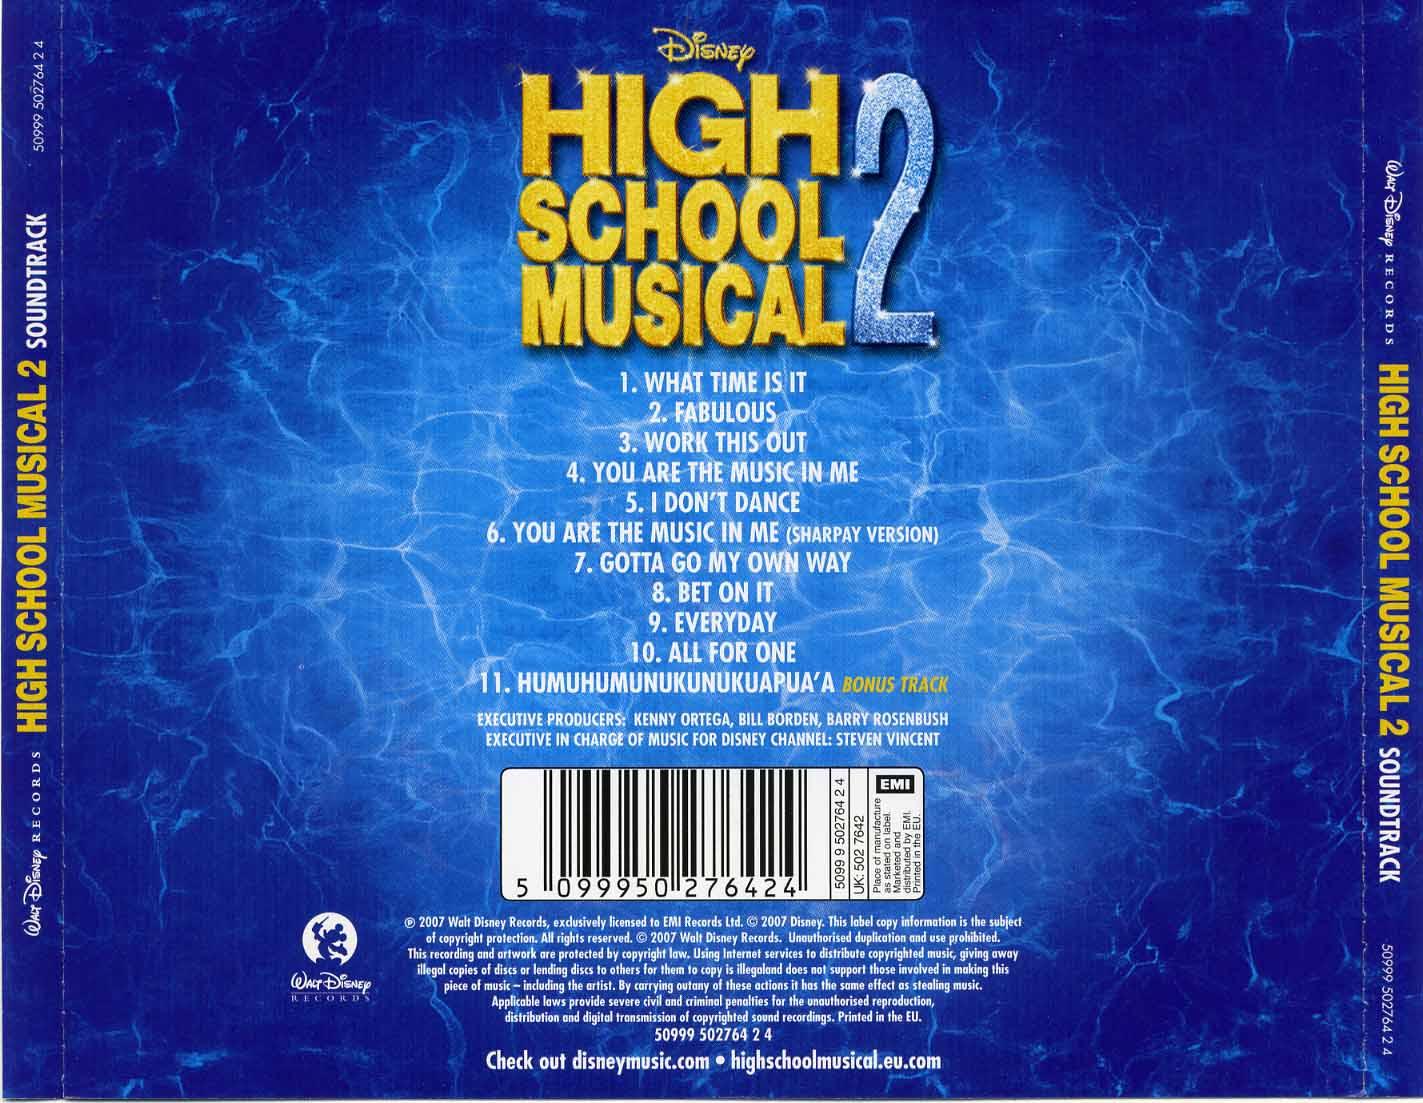 MegaPost High School Musical CoversBlogCD